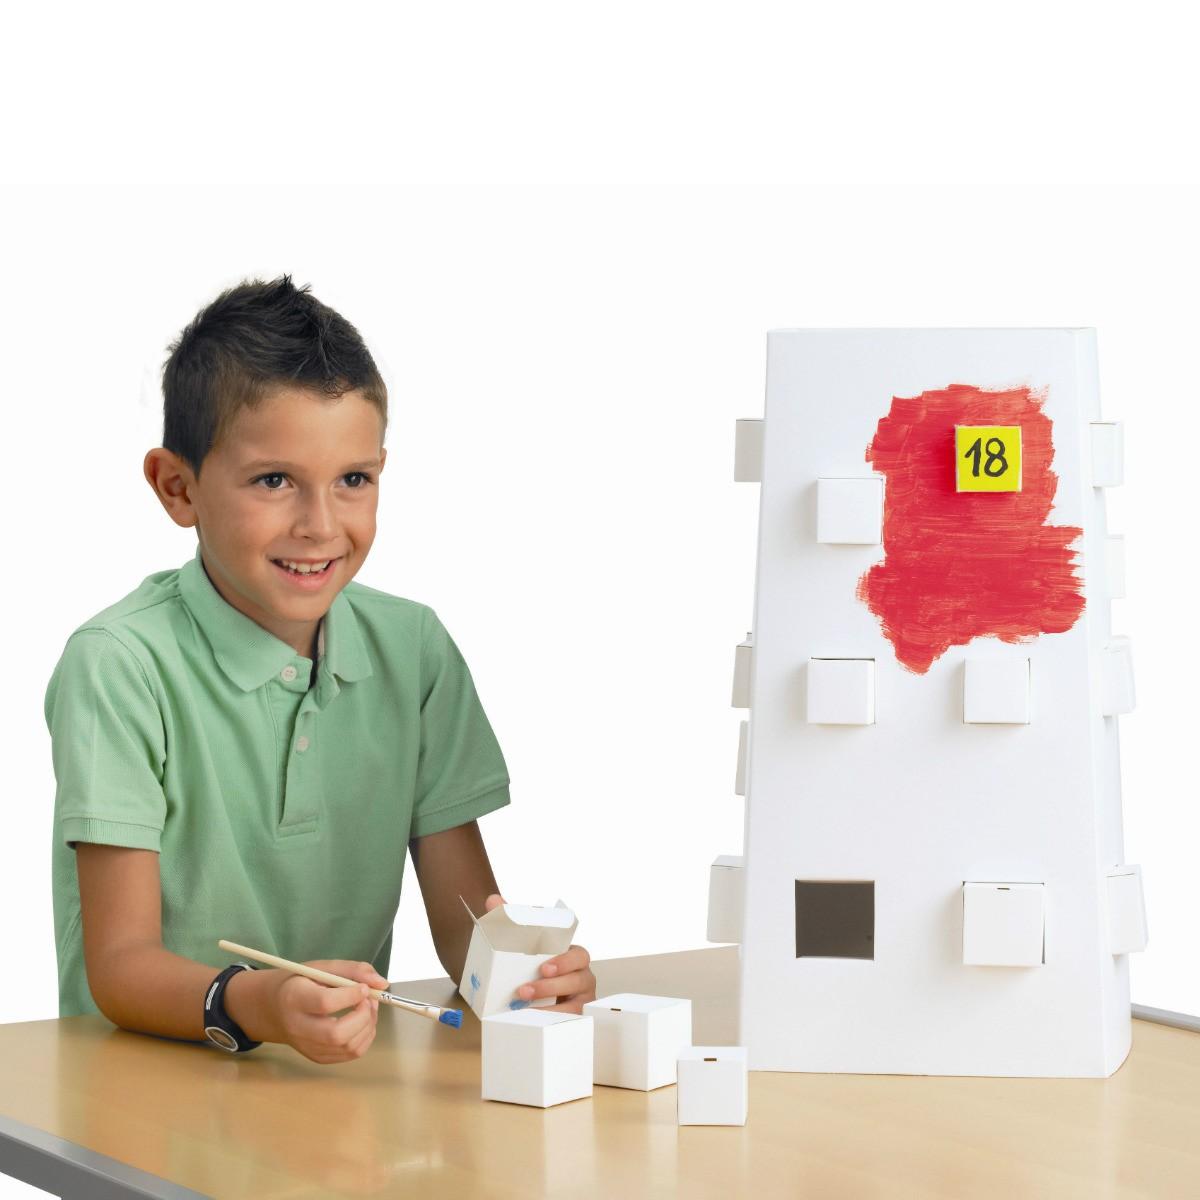 Adventskalender Rohling - Turm Magic Tower - blanko weiß zum Bemalen, H 49cm